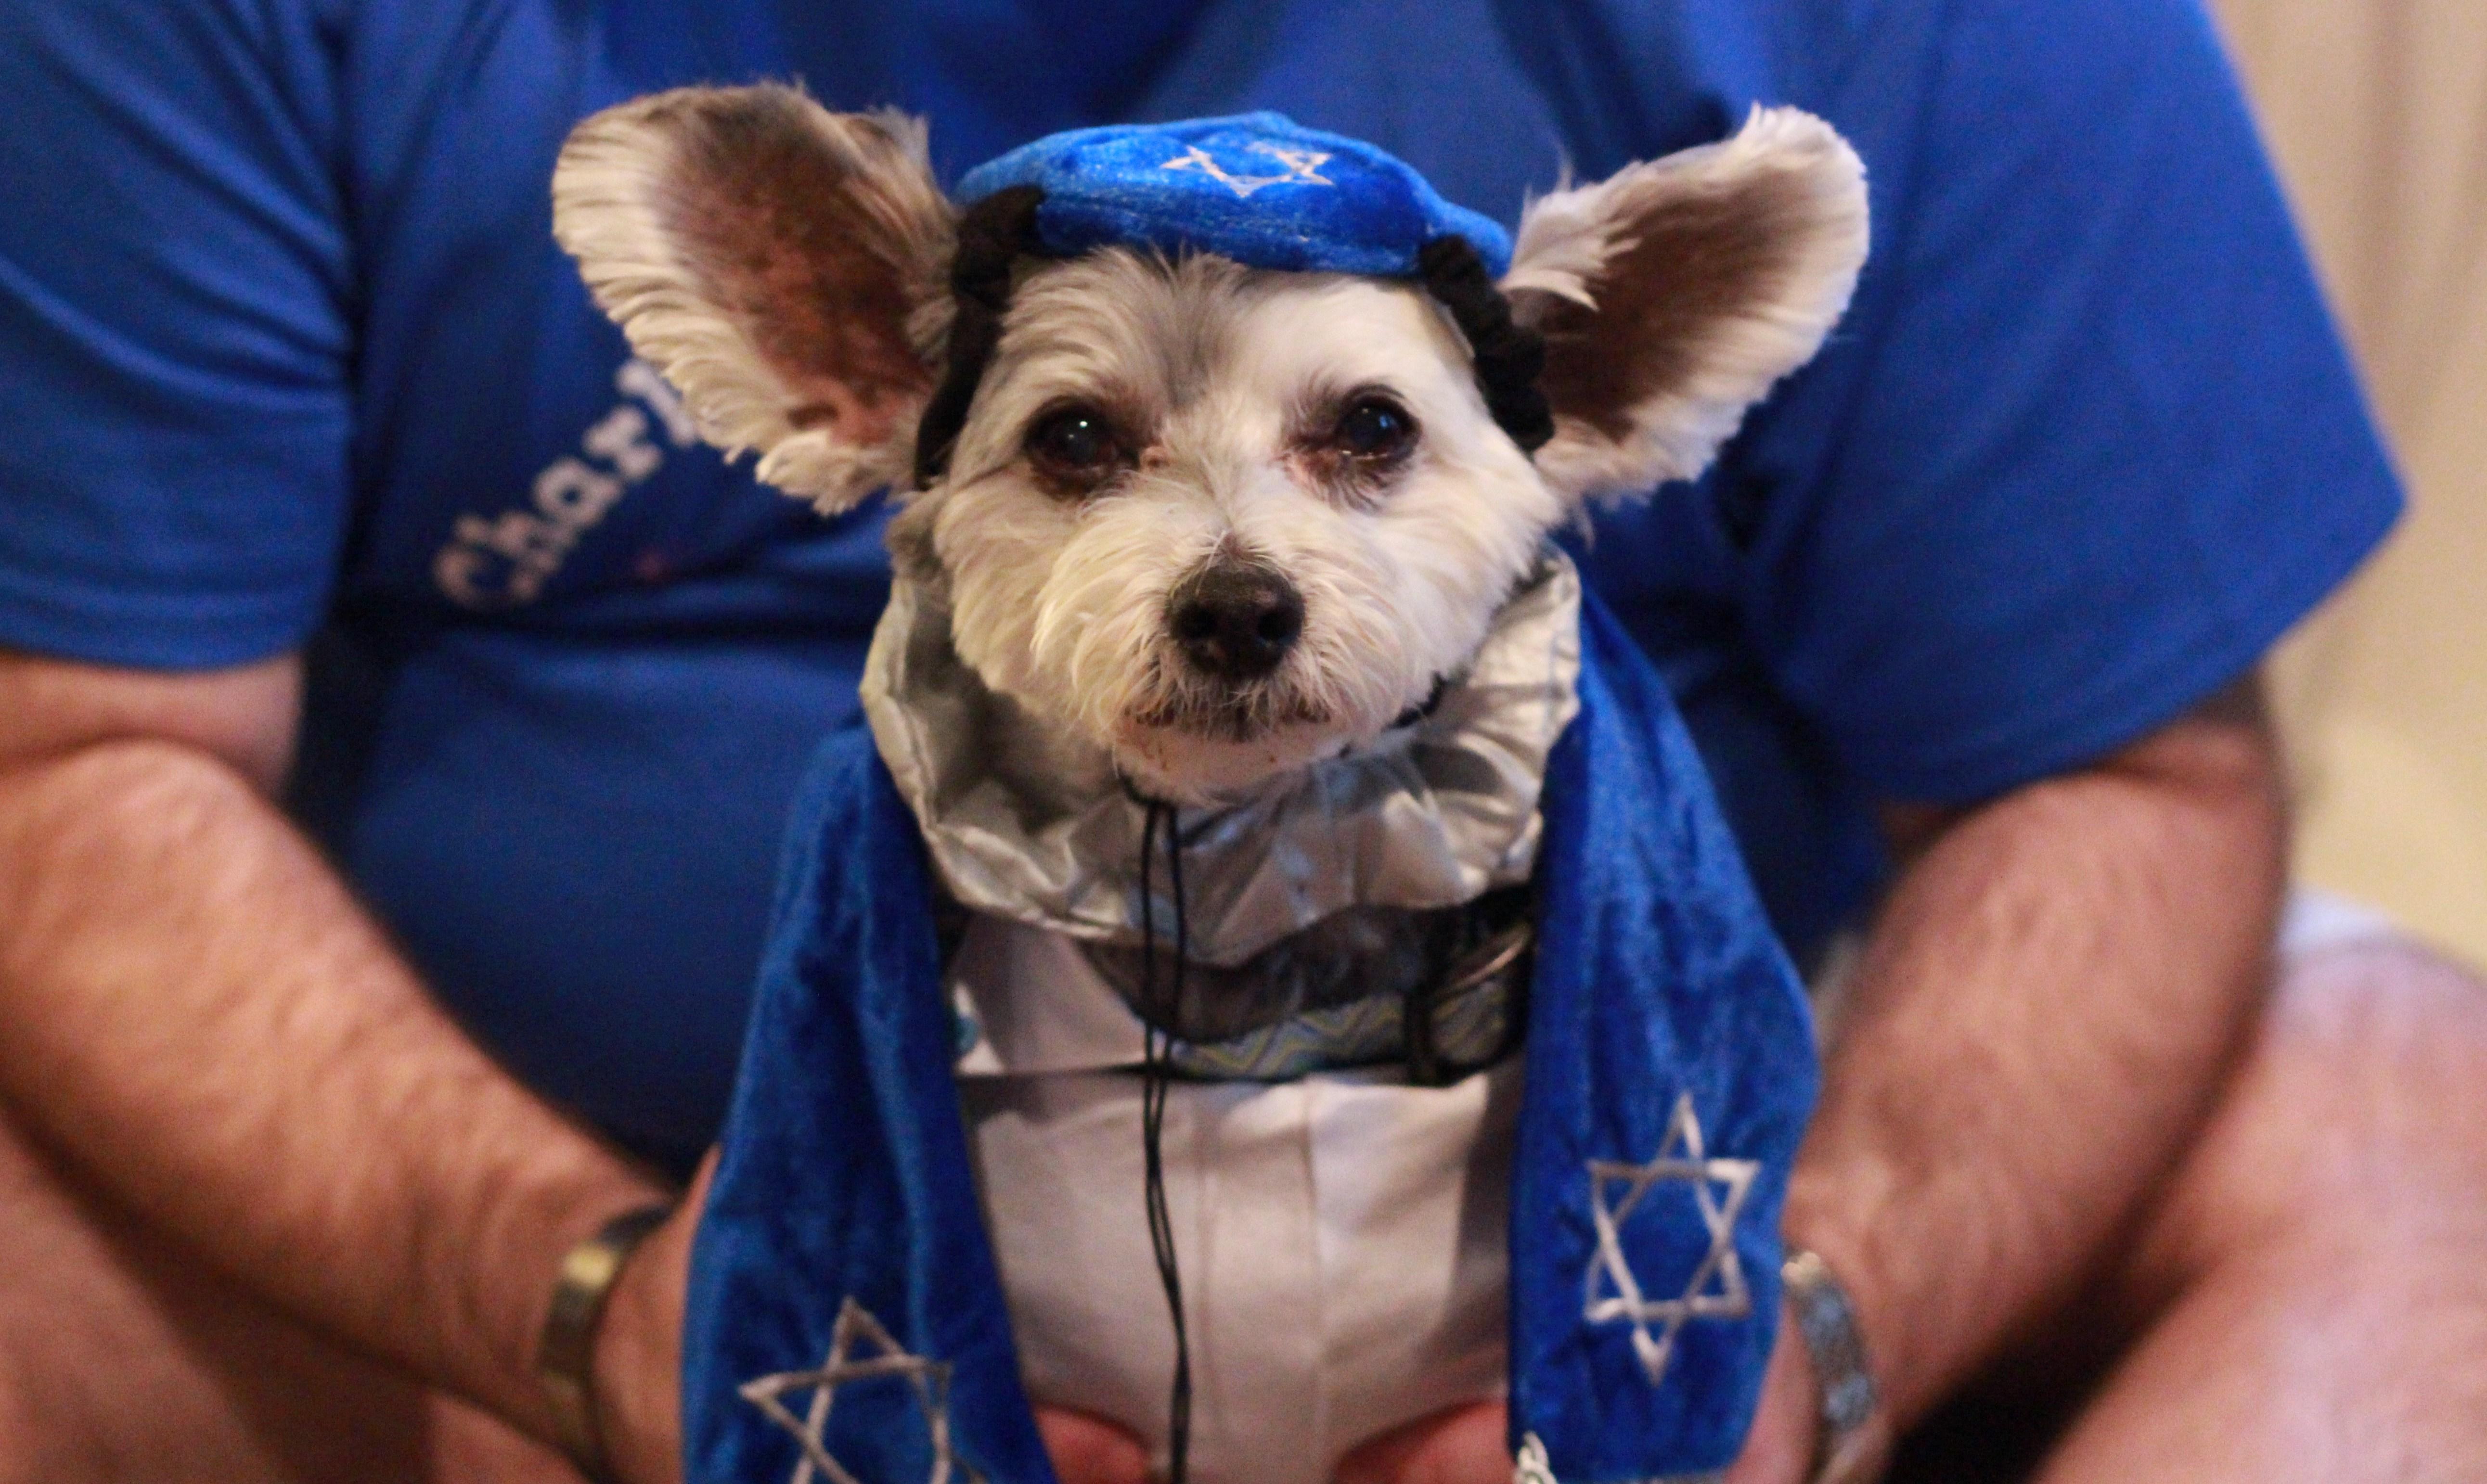 Charley-Bark-Mitzvah-1